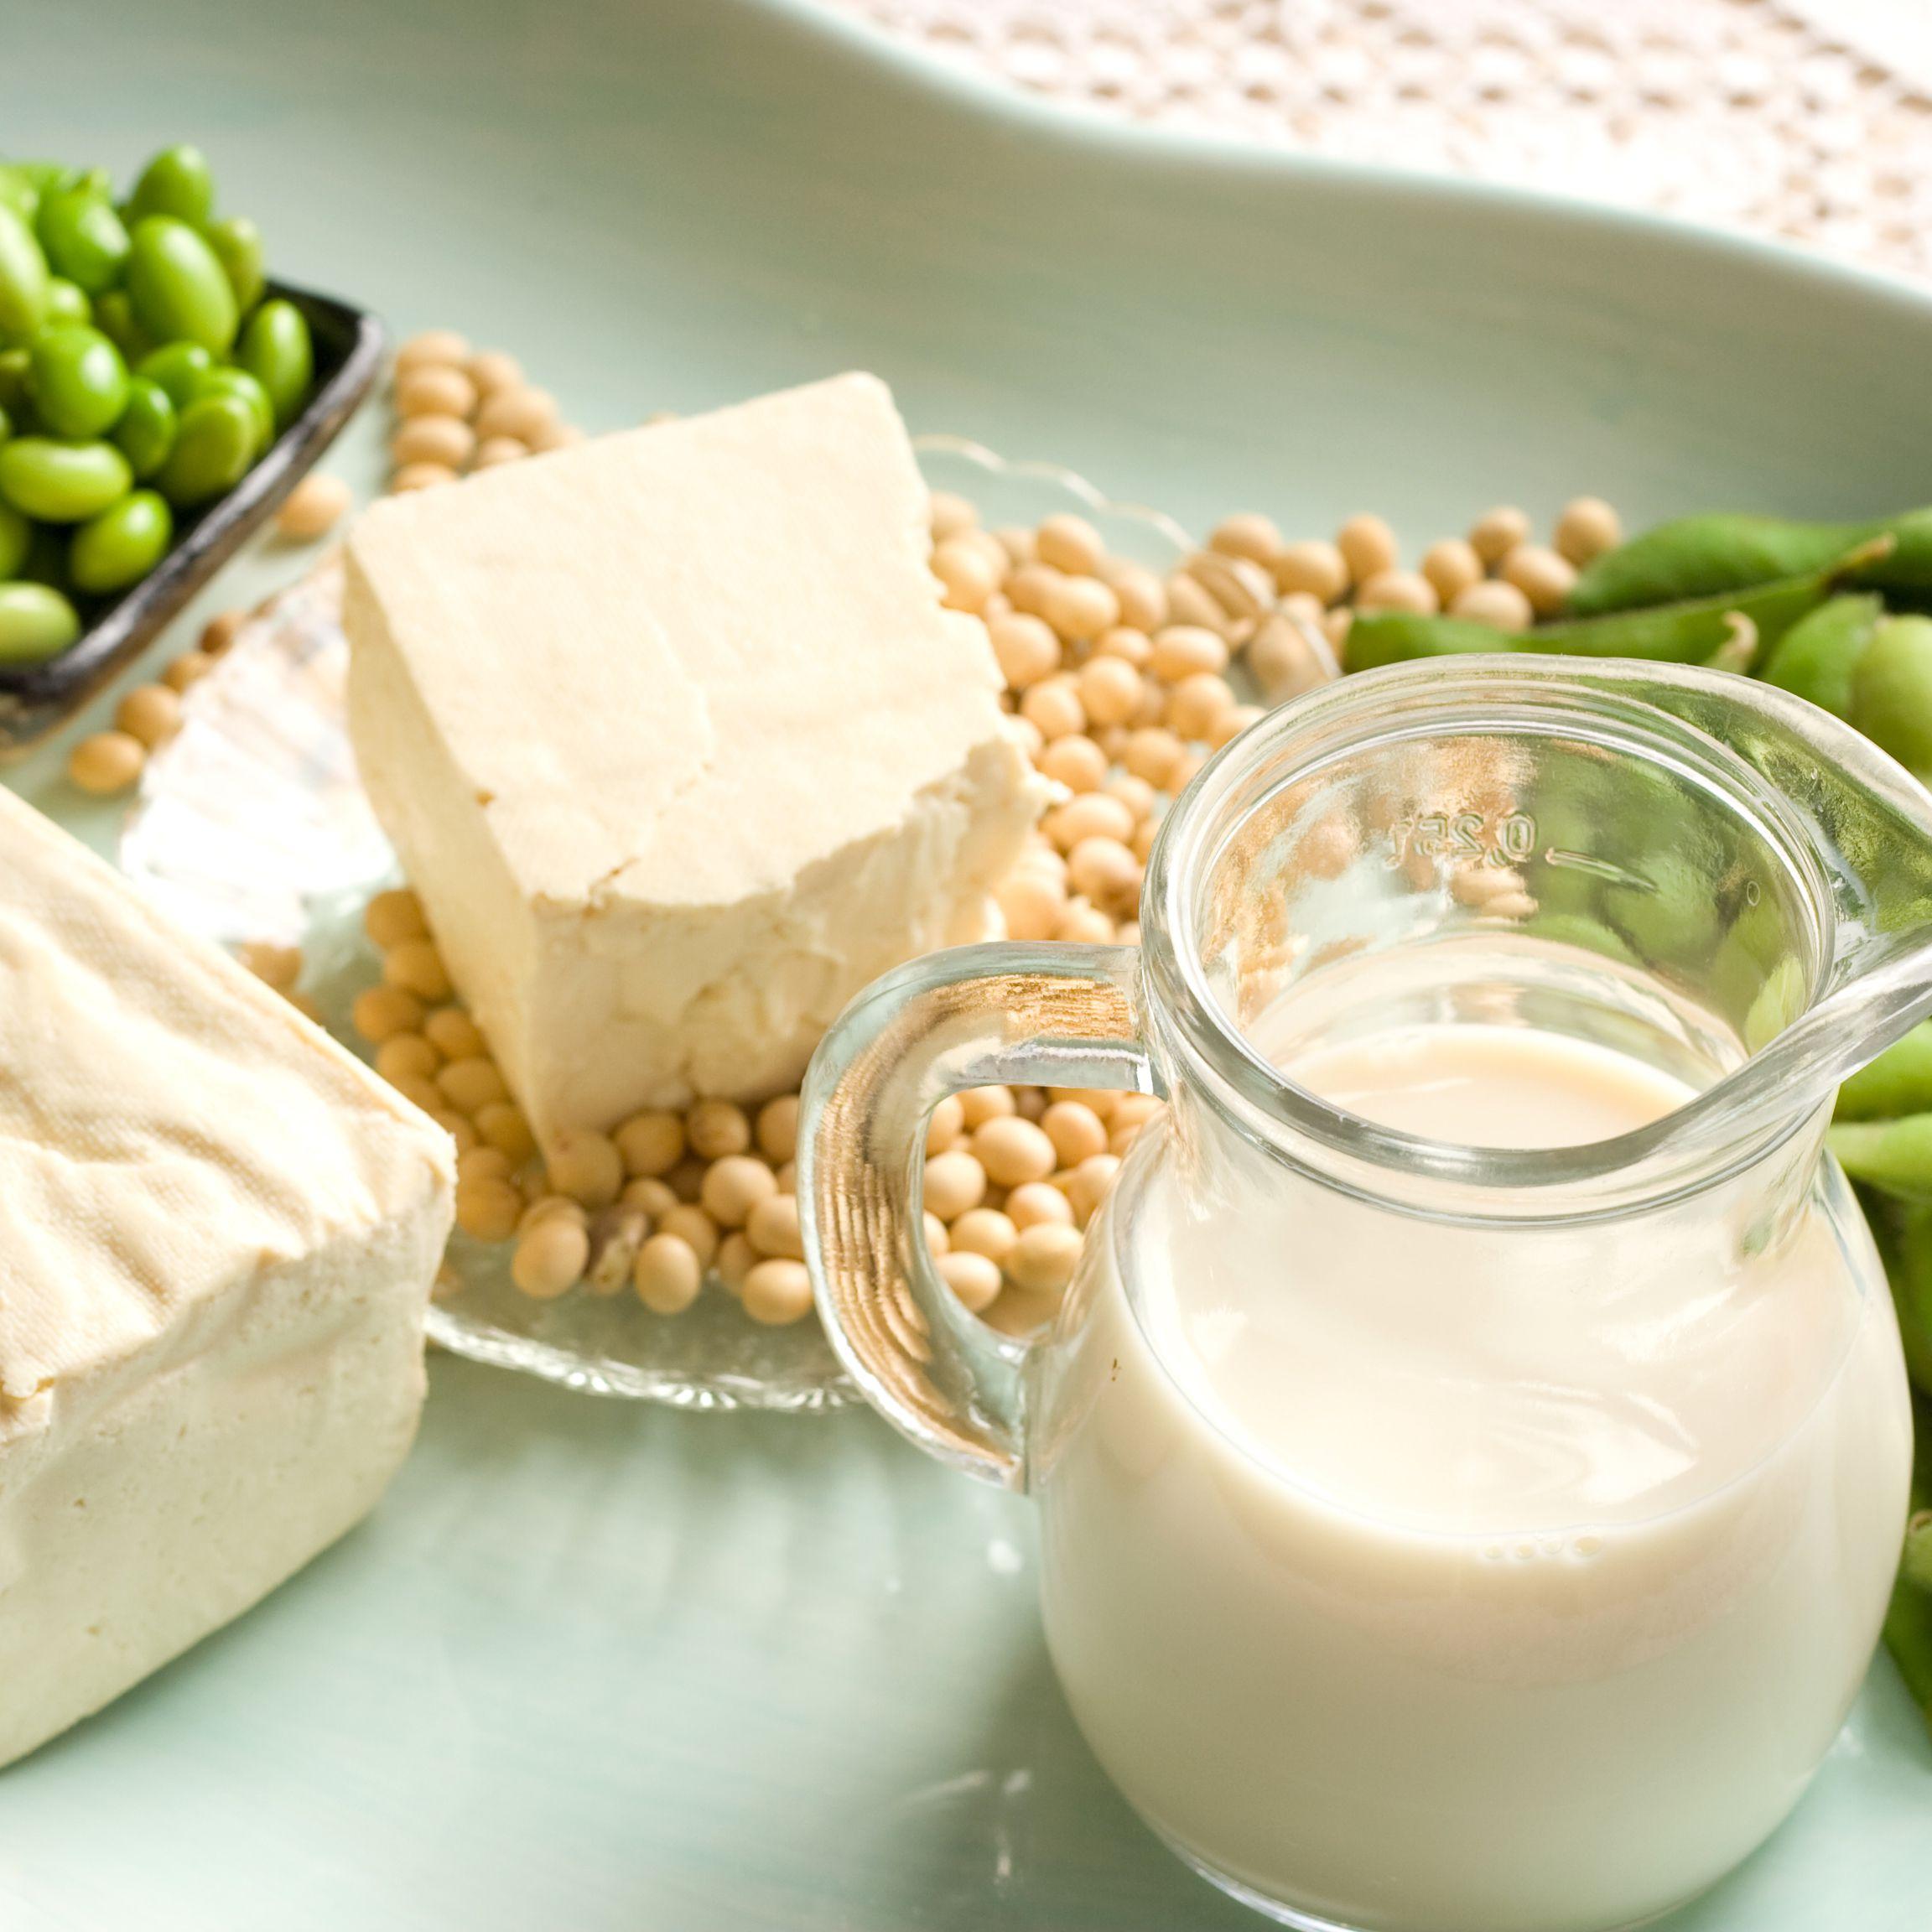 The Health Benefits of Isoflavones